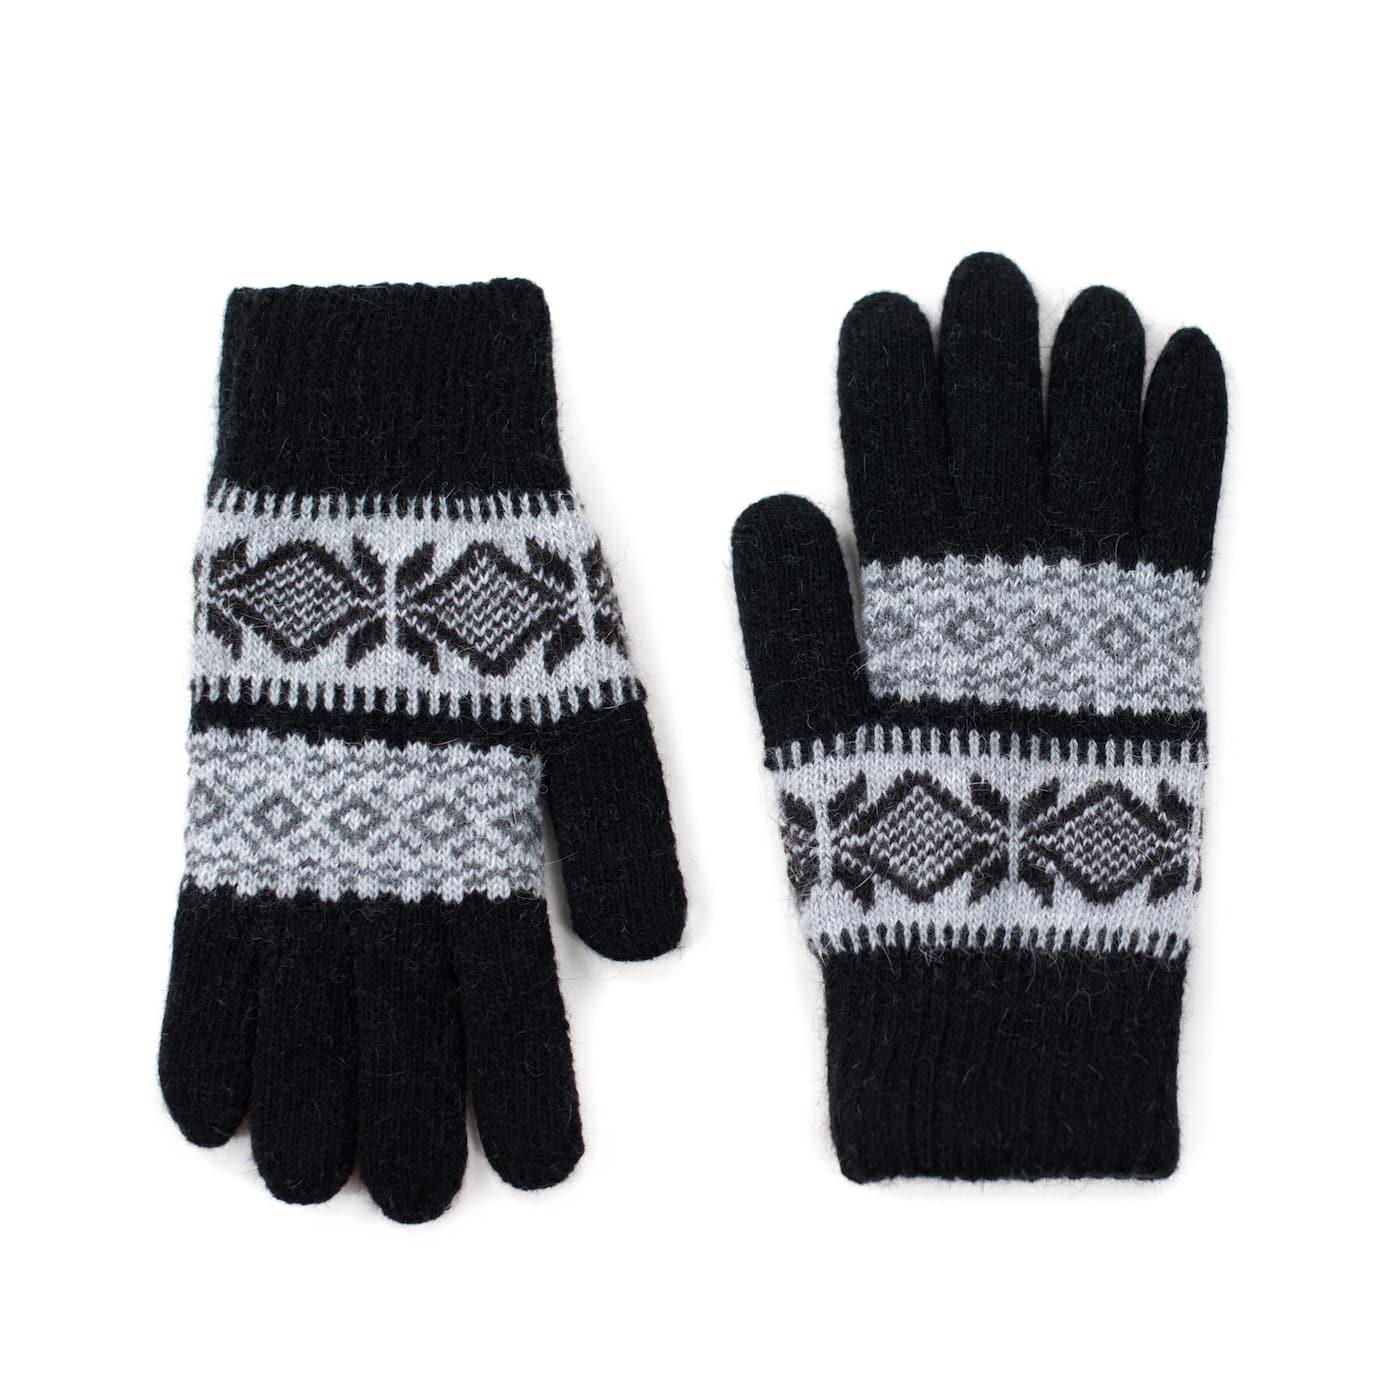 Art Of Polo Man's Gloves rk18406